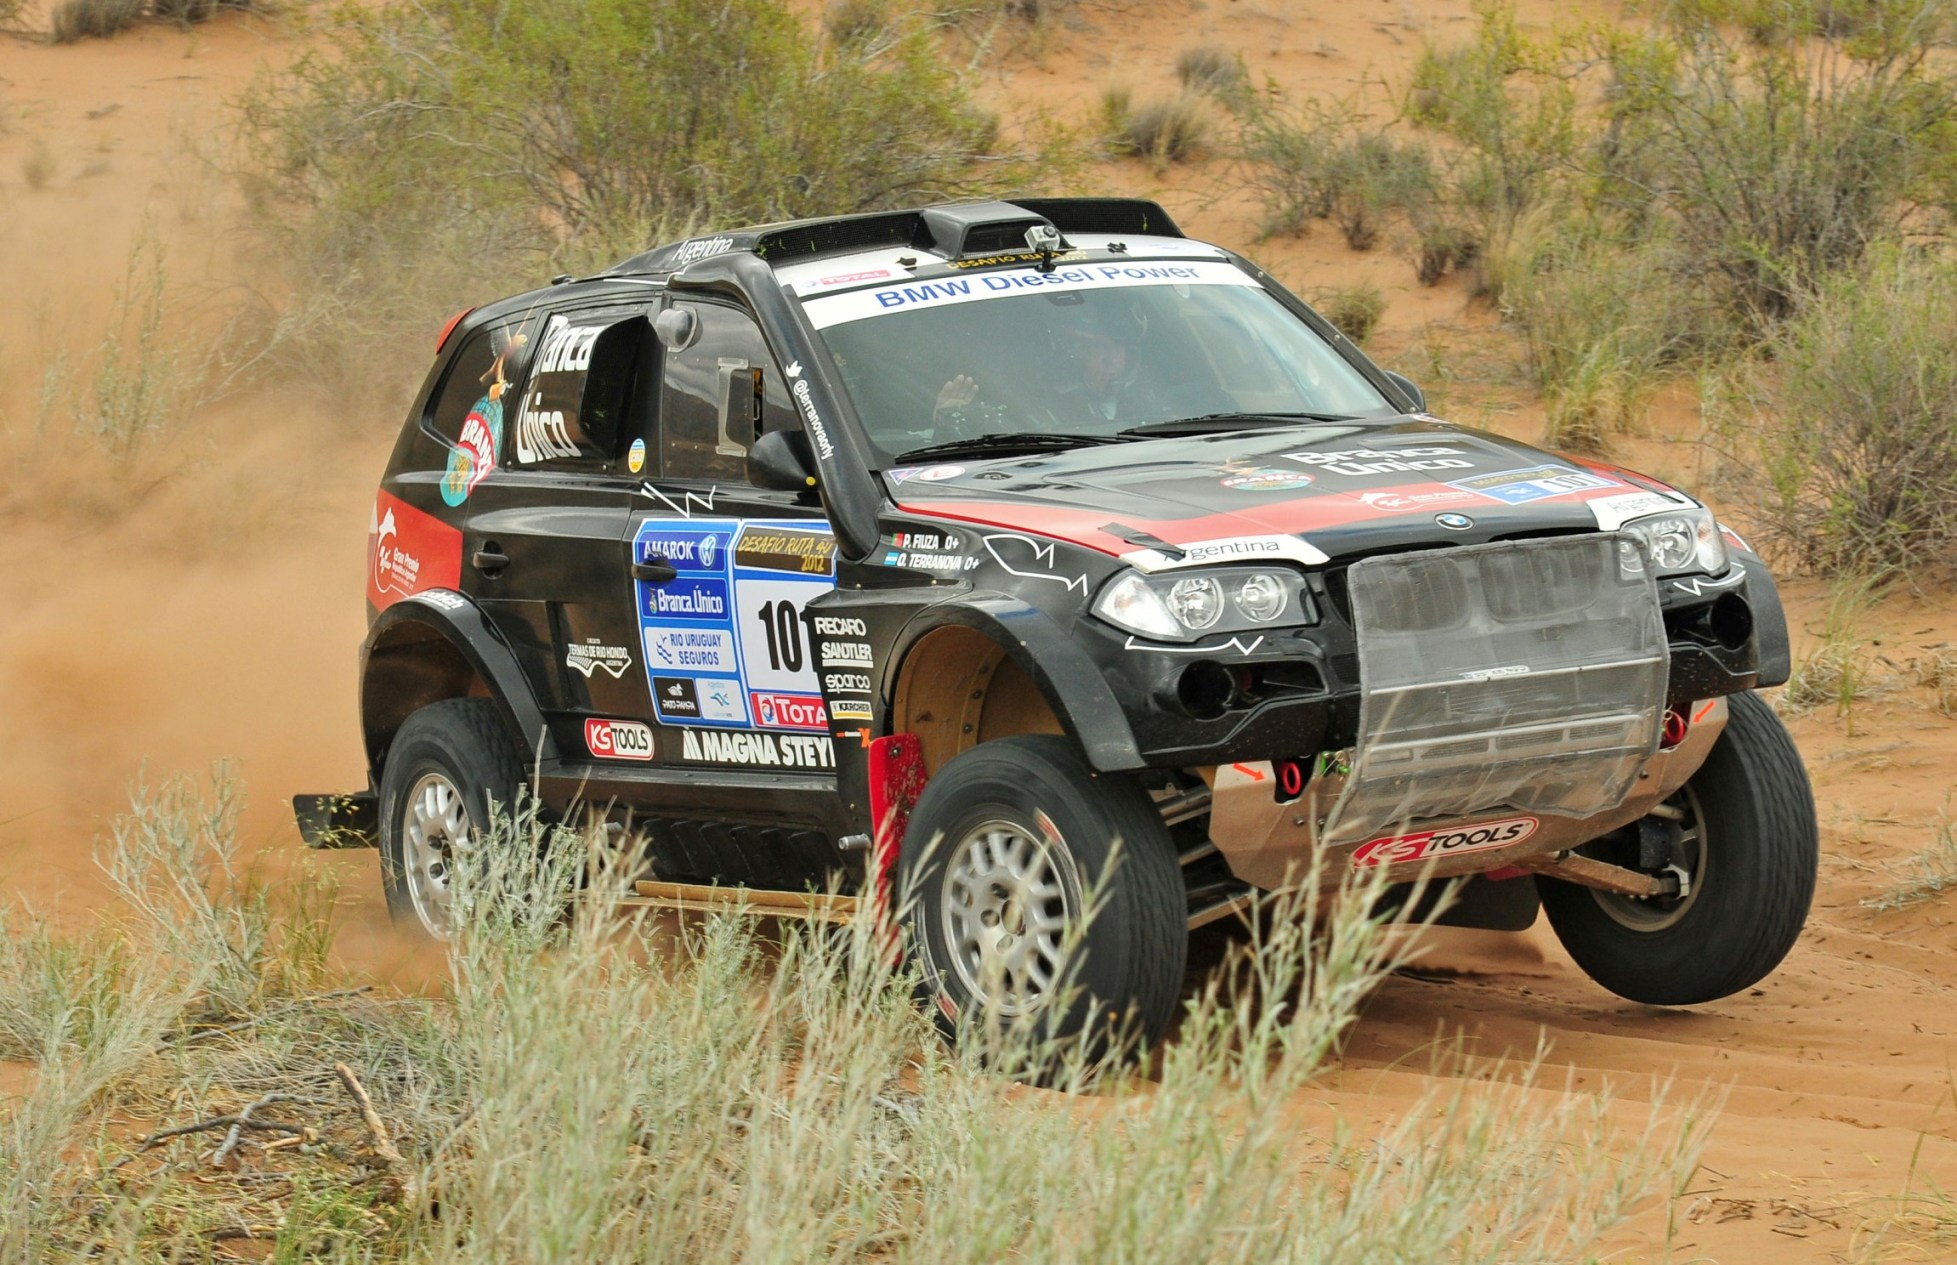 Terranova ganó antes el Litoral, ahora el Ruta 40, y lo espera el Dakar